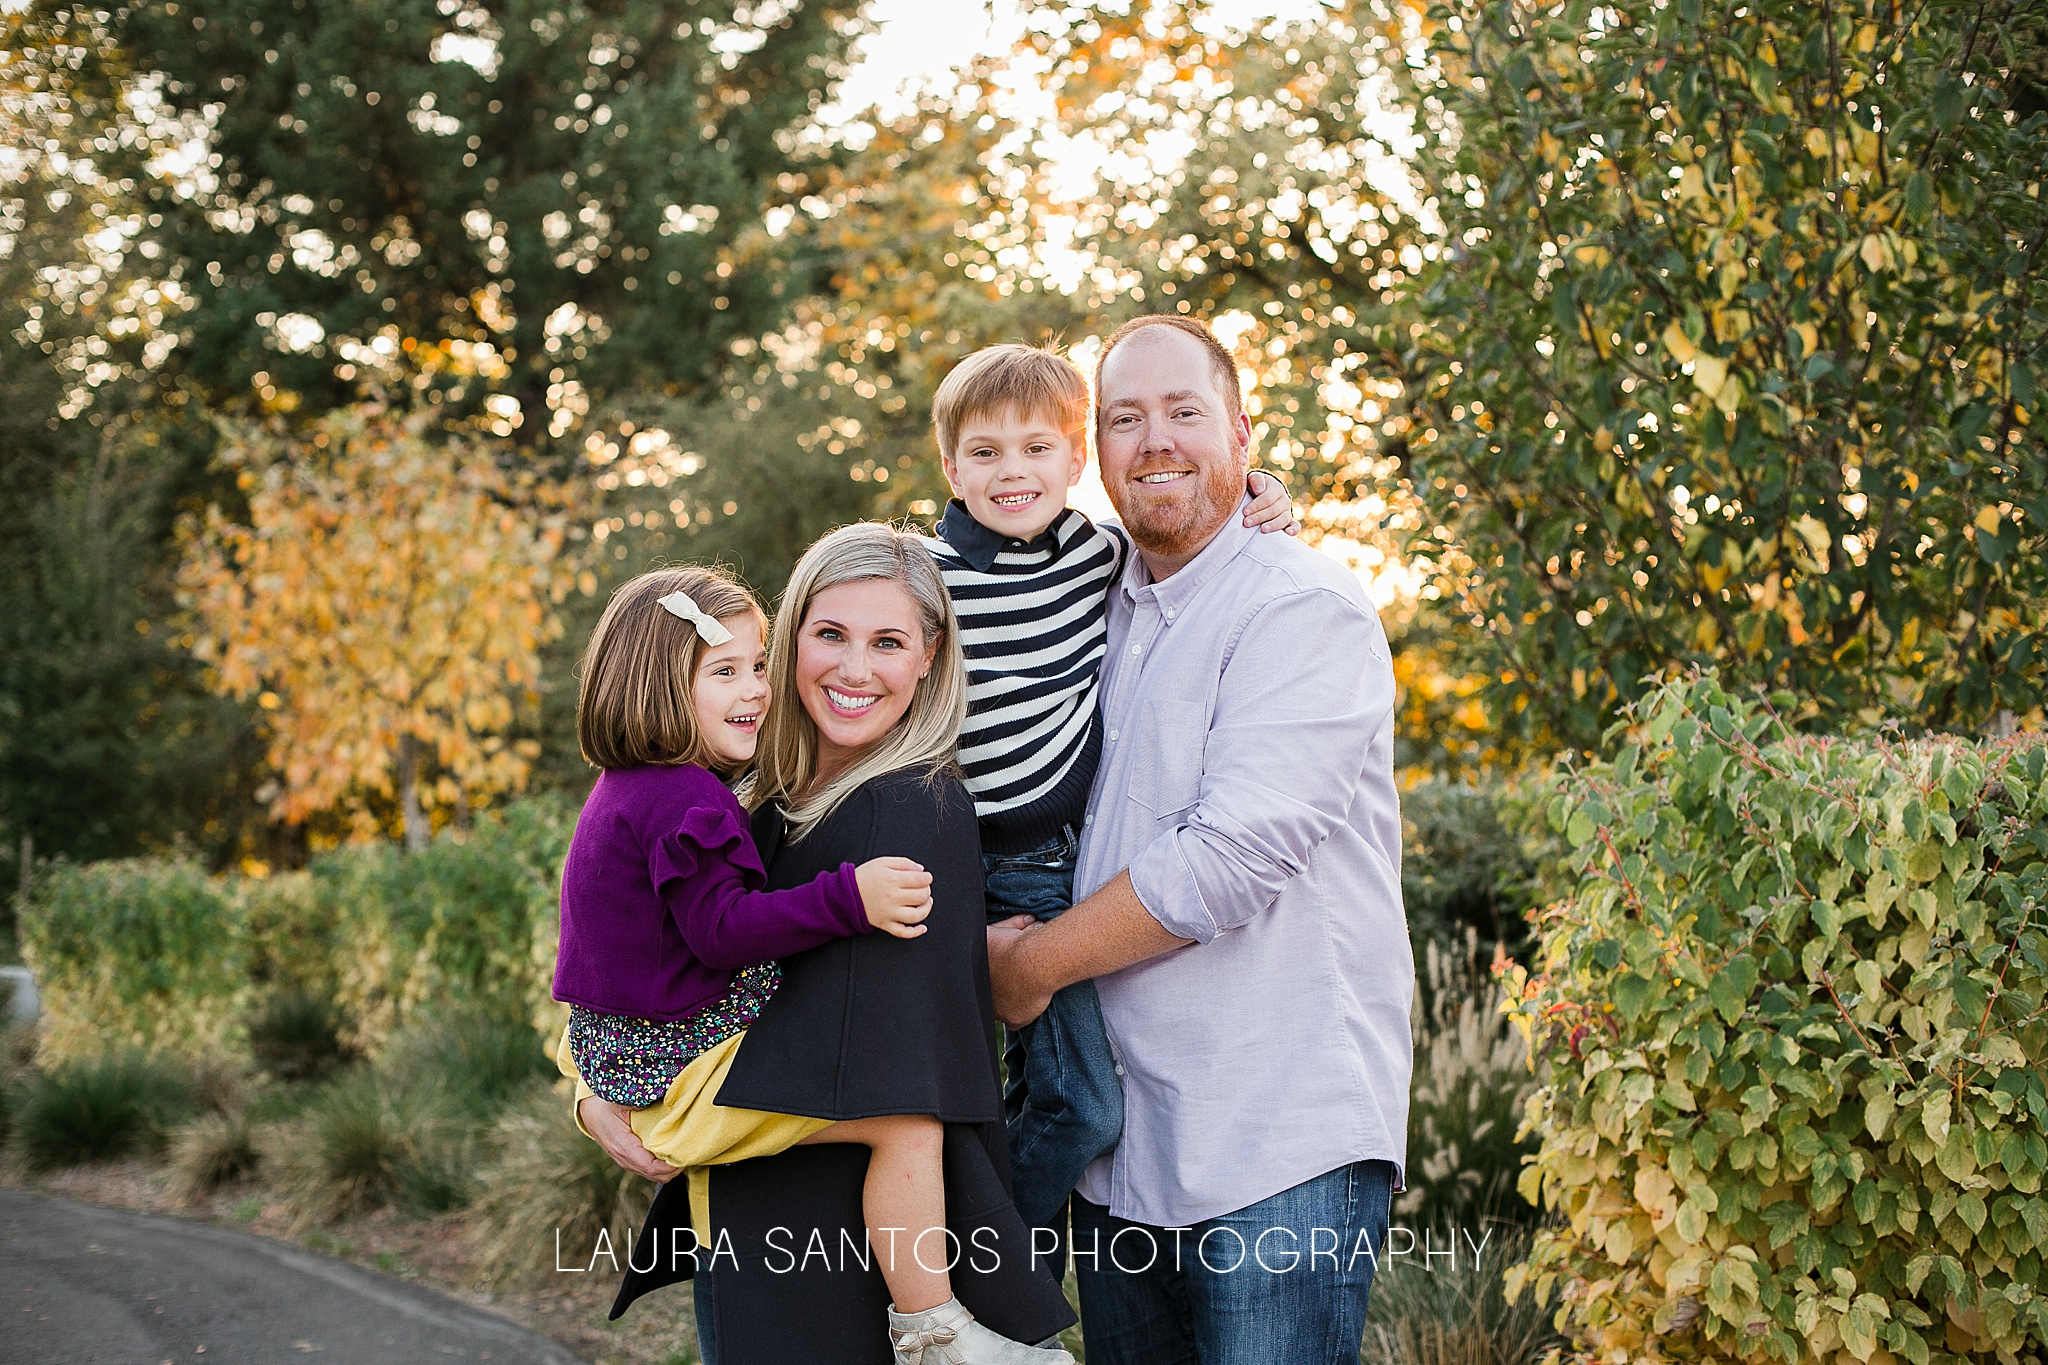 Laura Santos Photography Portland Oregon Family Photographer_0847.jpg